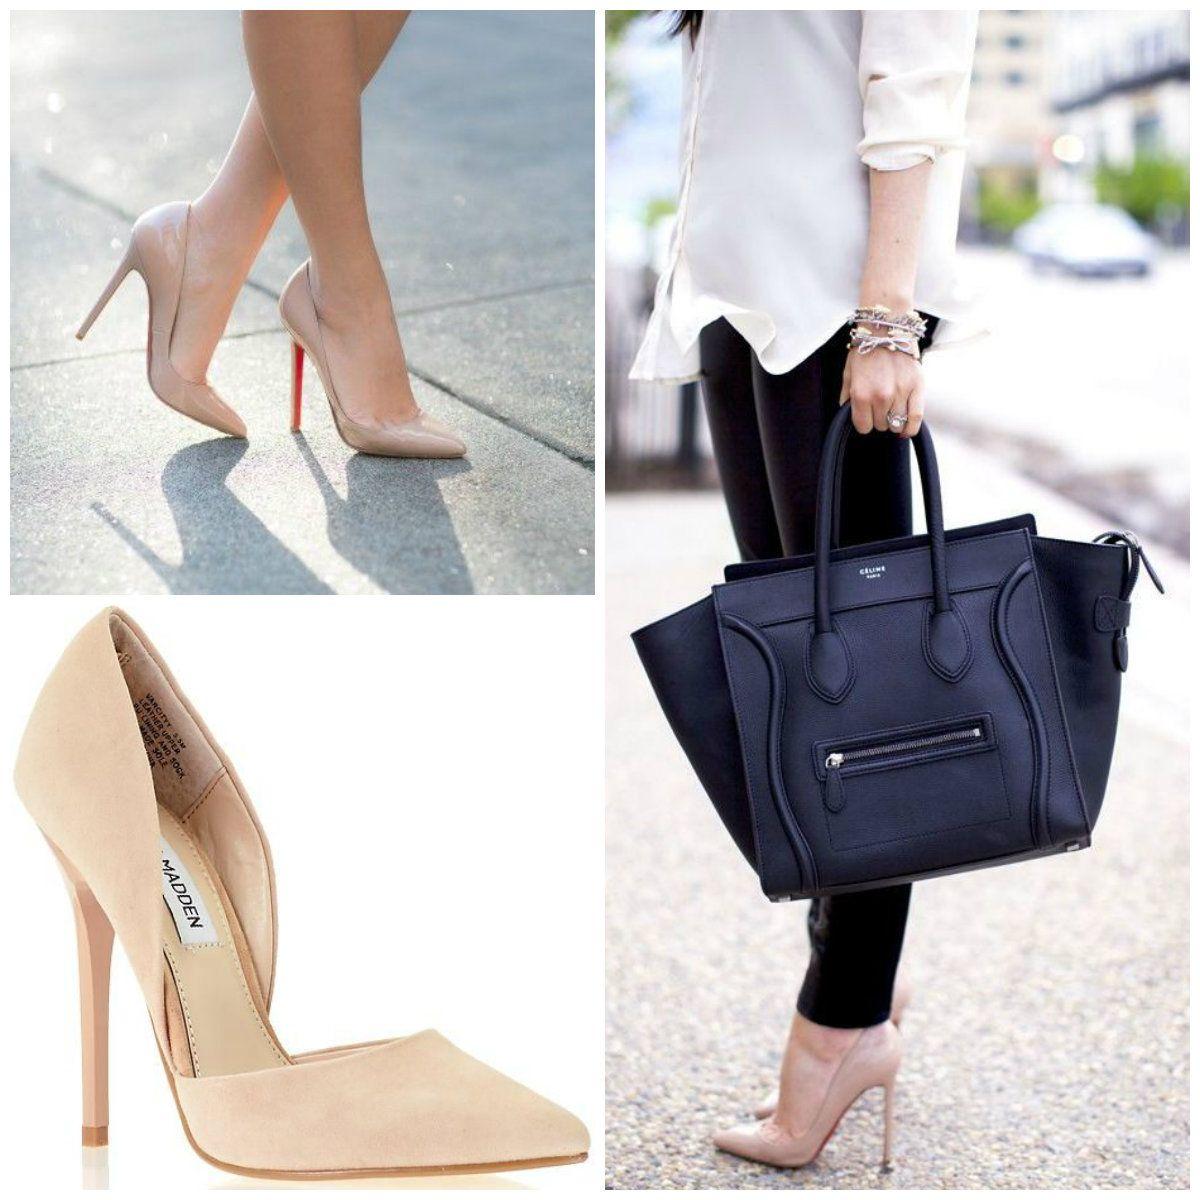 zapatos que todas debemos tener | ActitudFEM